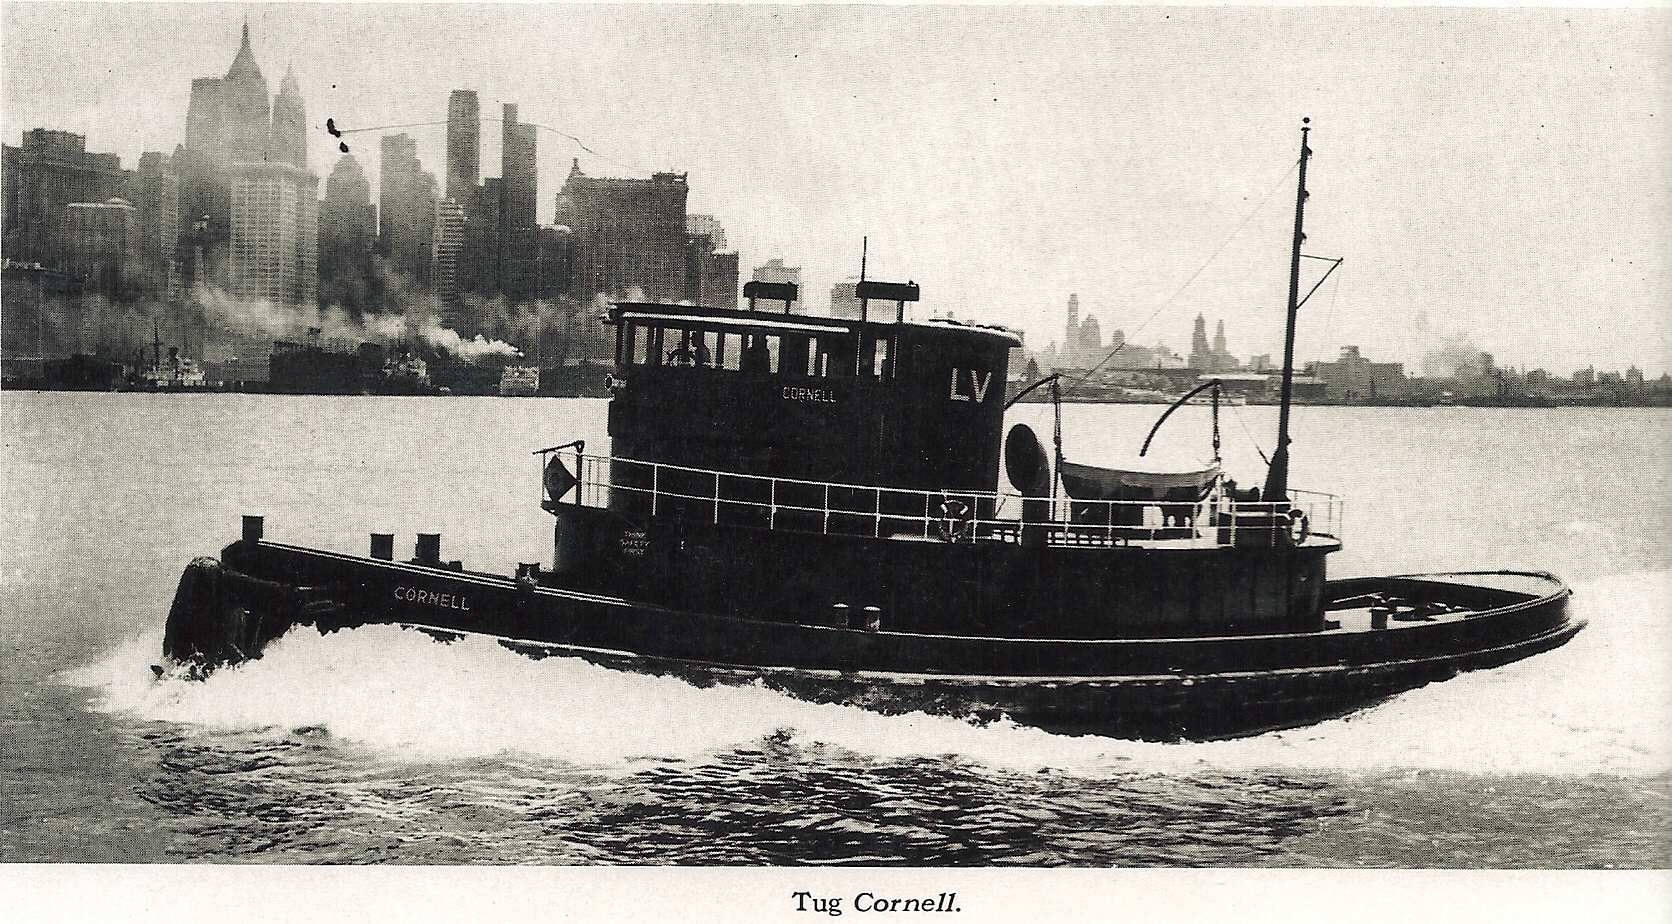 LVRR Tug   Cornell